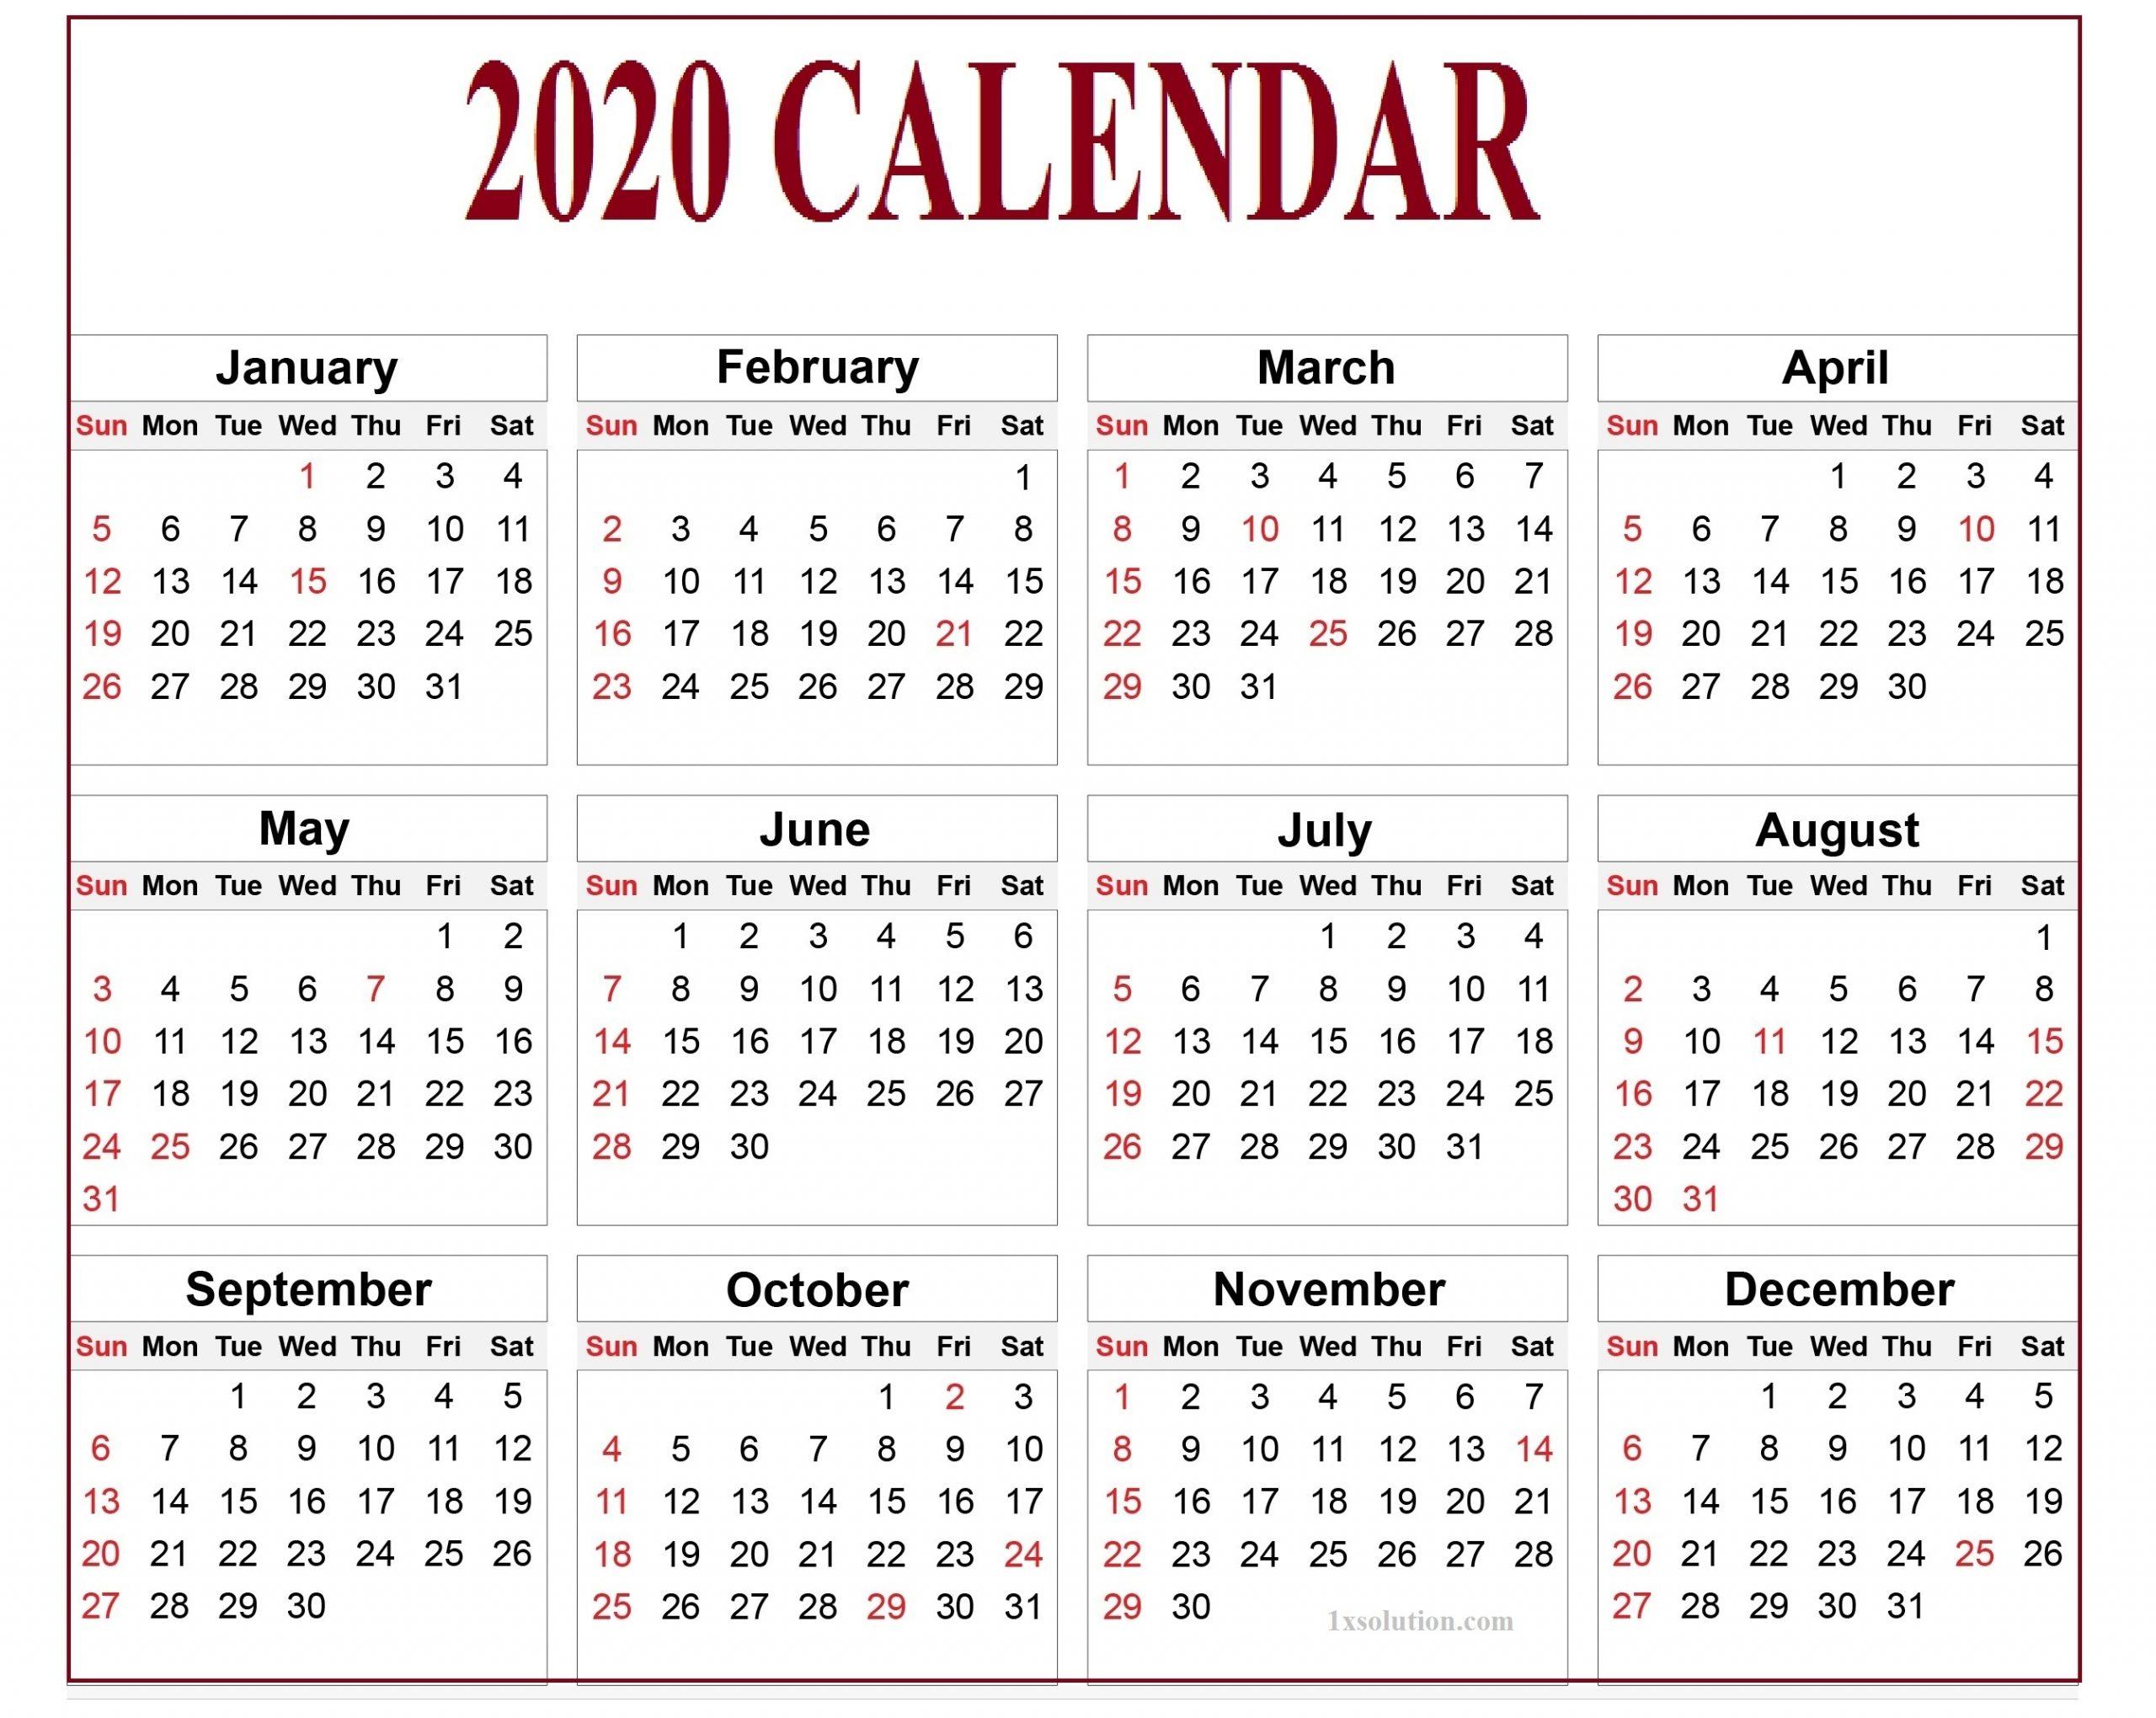 2020 Daily Calendar- To Write Your Important Notes | | Calendar